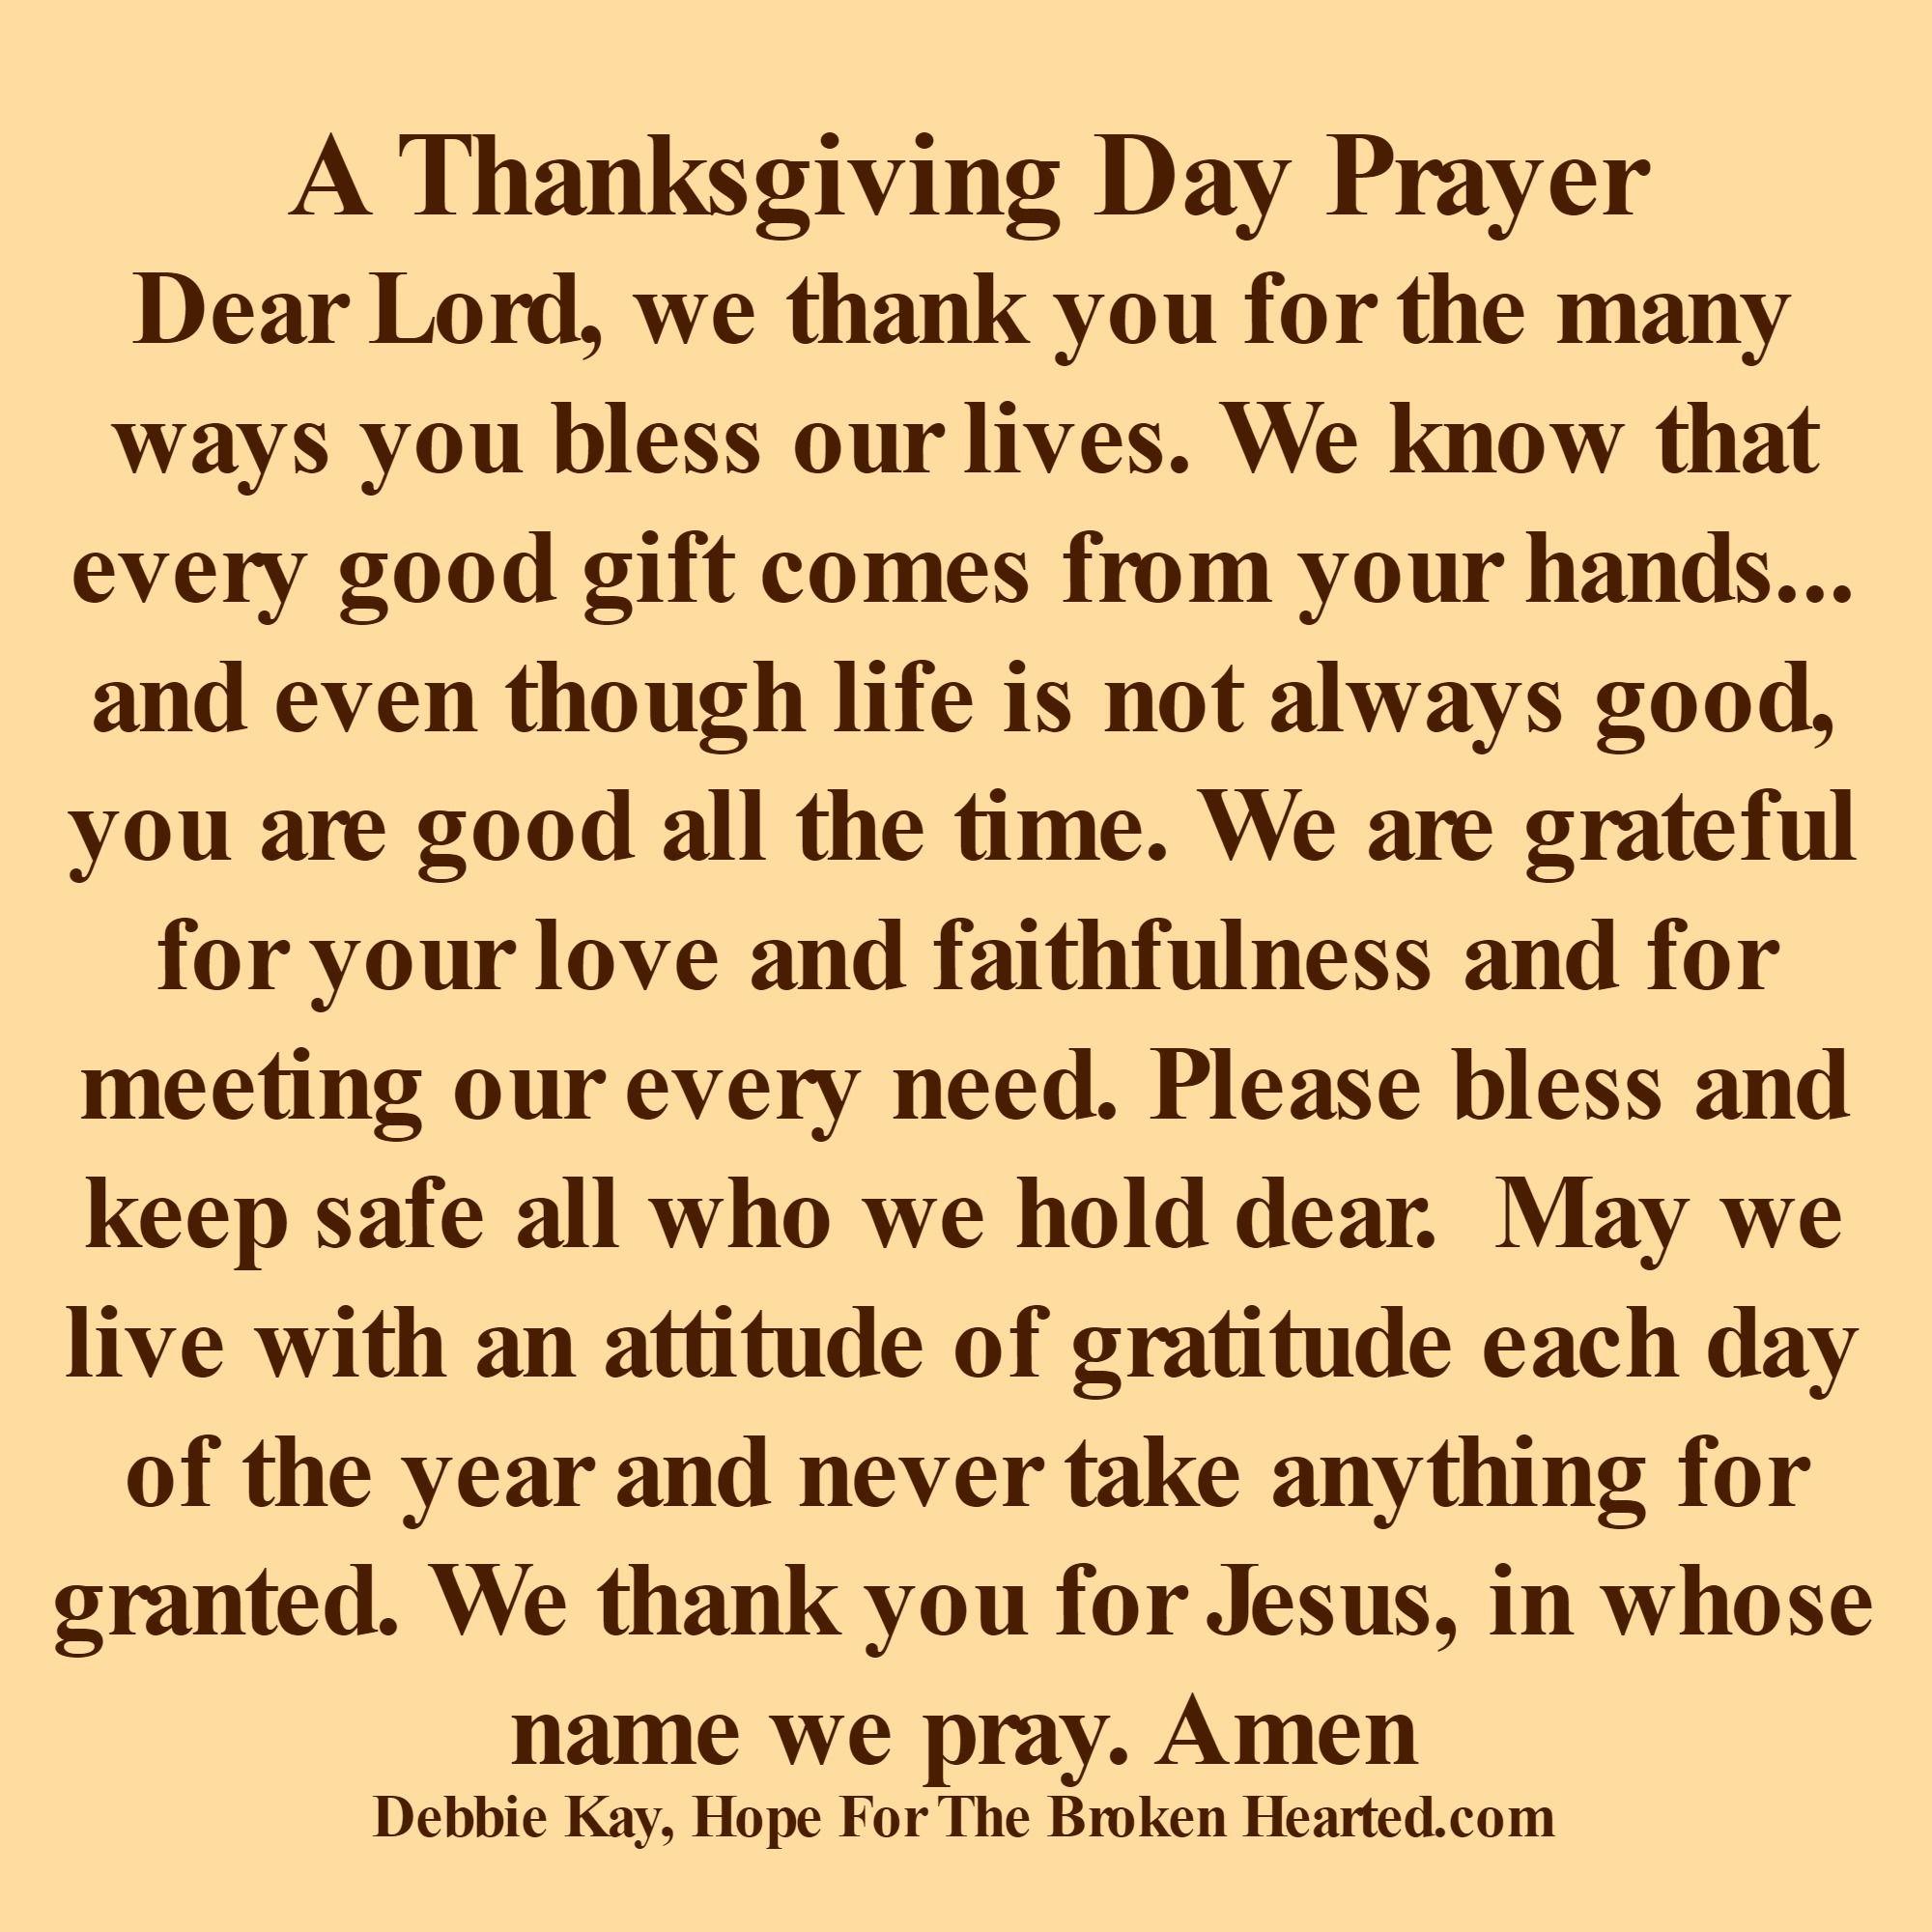 Todays Prayer Quotes Thanksgiving Day Prayer  Prayers  Pinterest  Thanksgiving